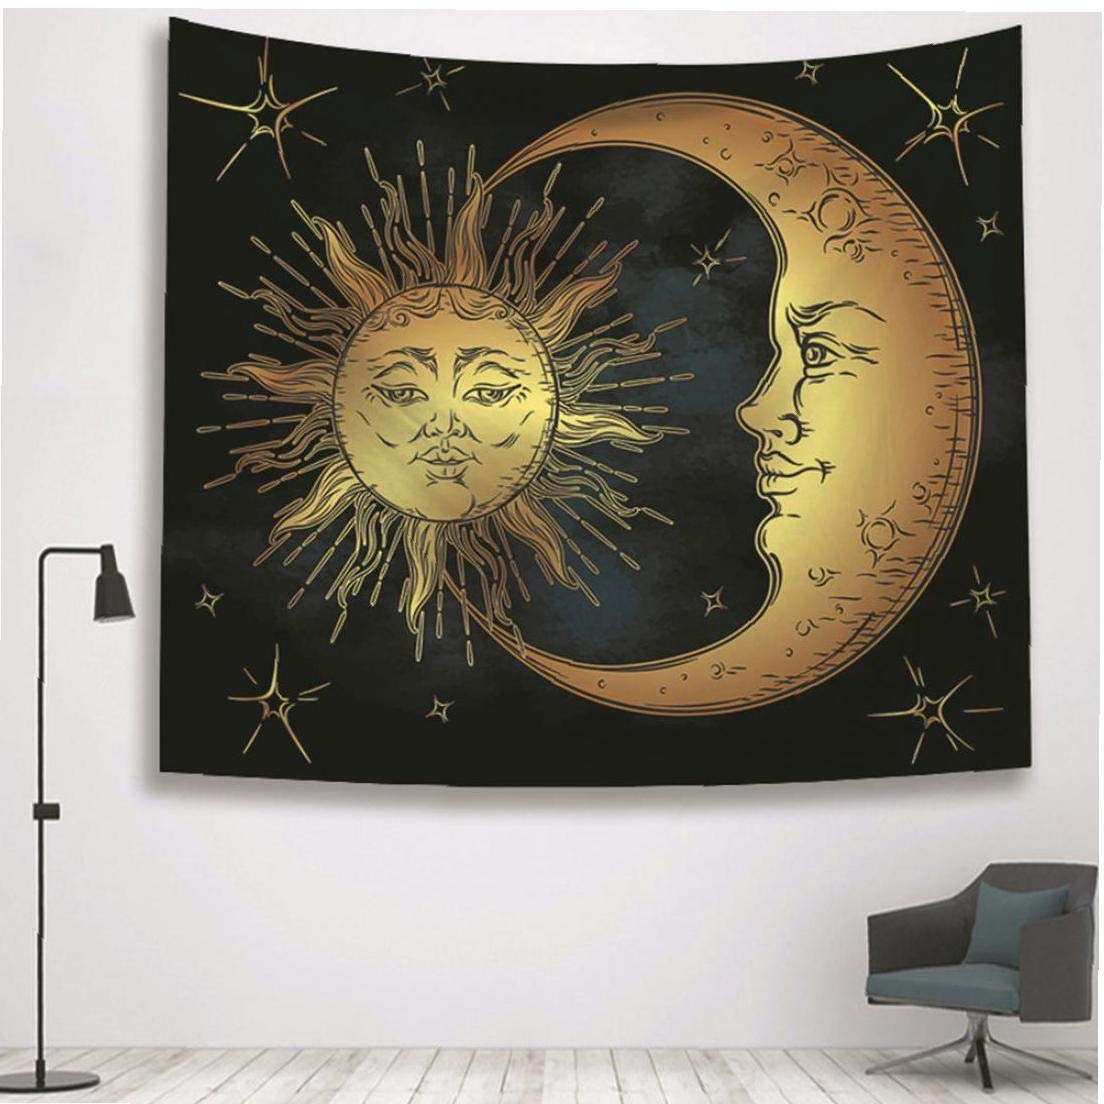 Sun celestial Luna Hippie colgar de la pared de la tapicer/ía de tela Brujer/ía pared Tapices de alfombras